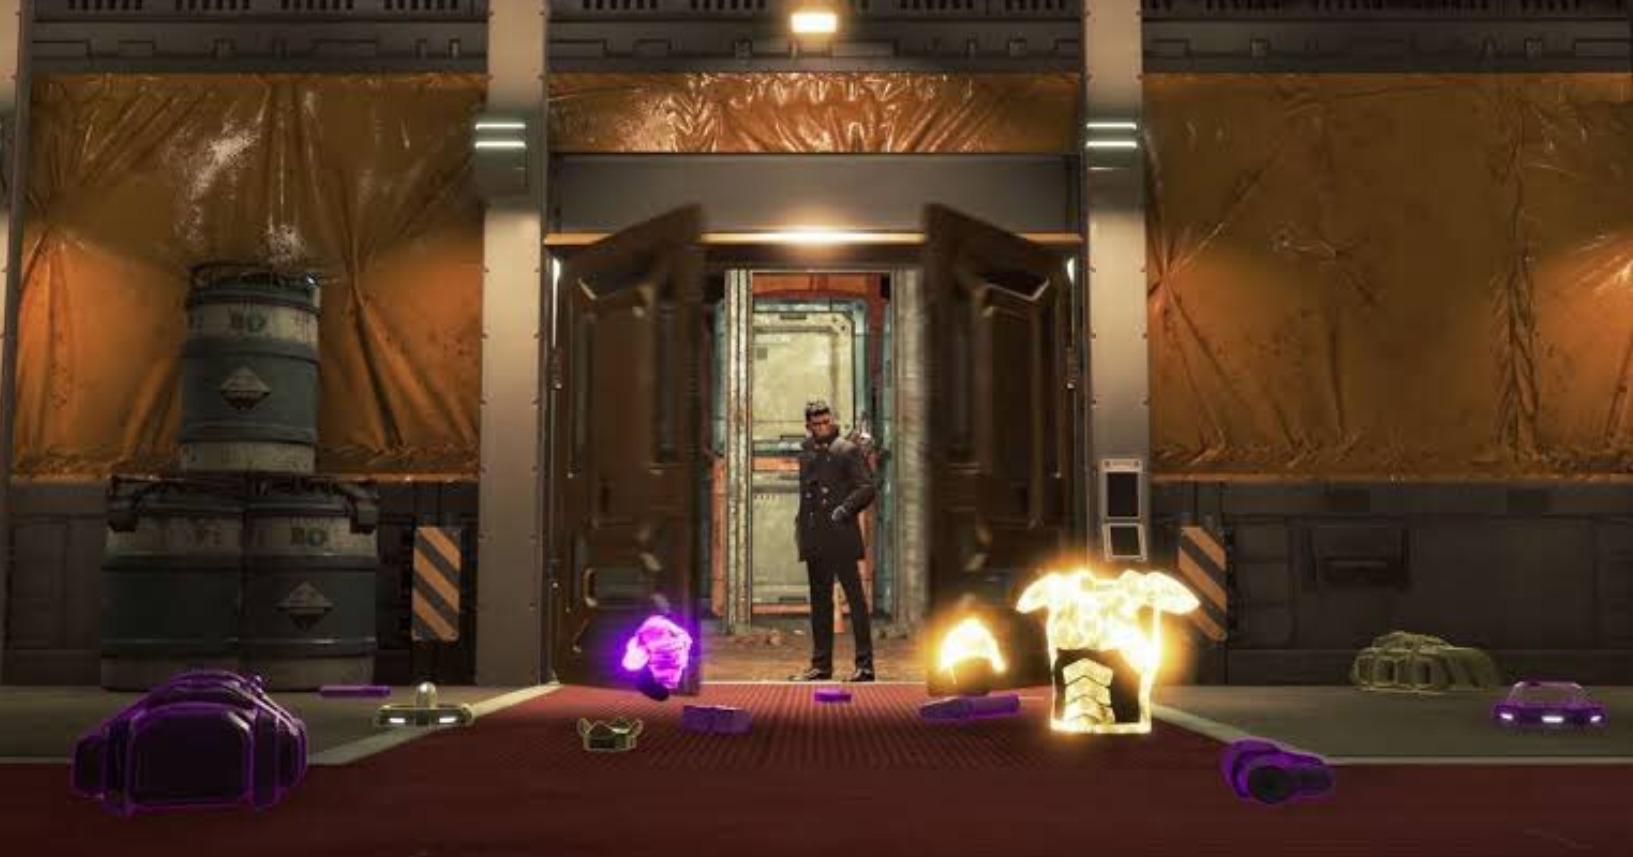 【Apex Legends】保管庫を一瞬で開ける方法【小技】【エーペックスレジェンズ】